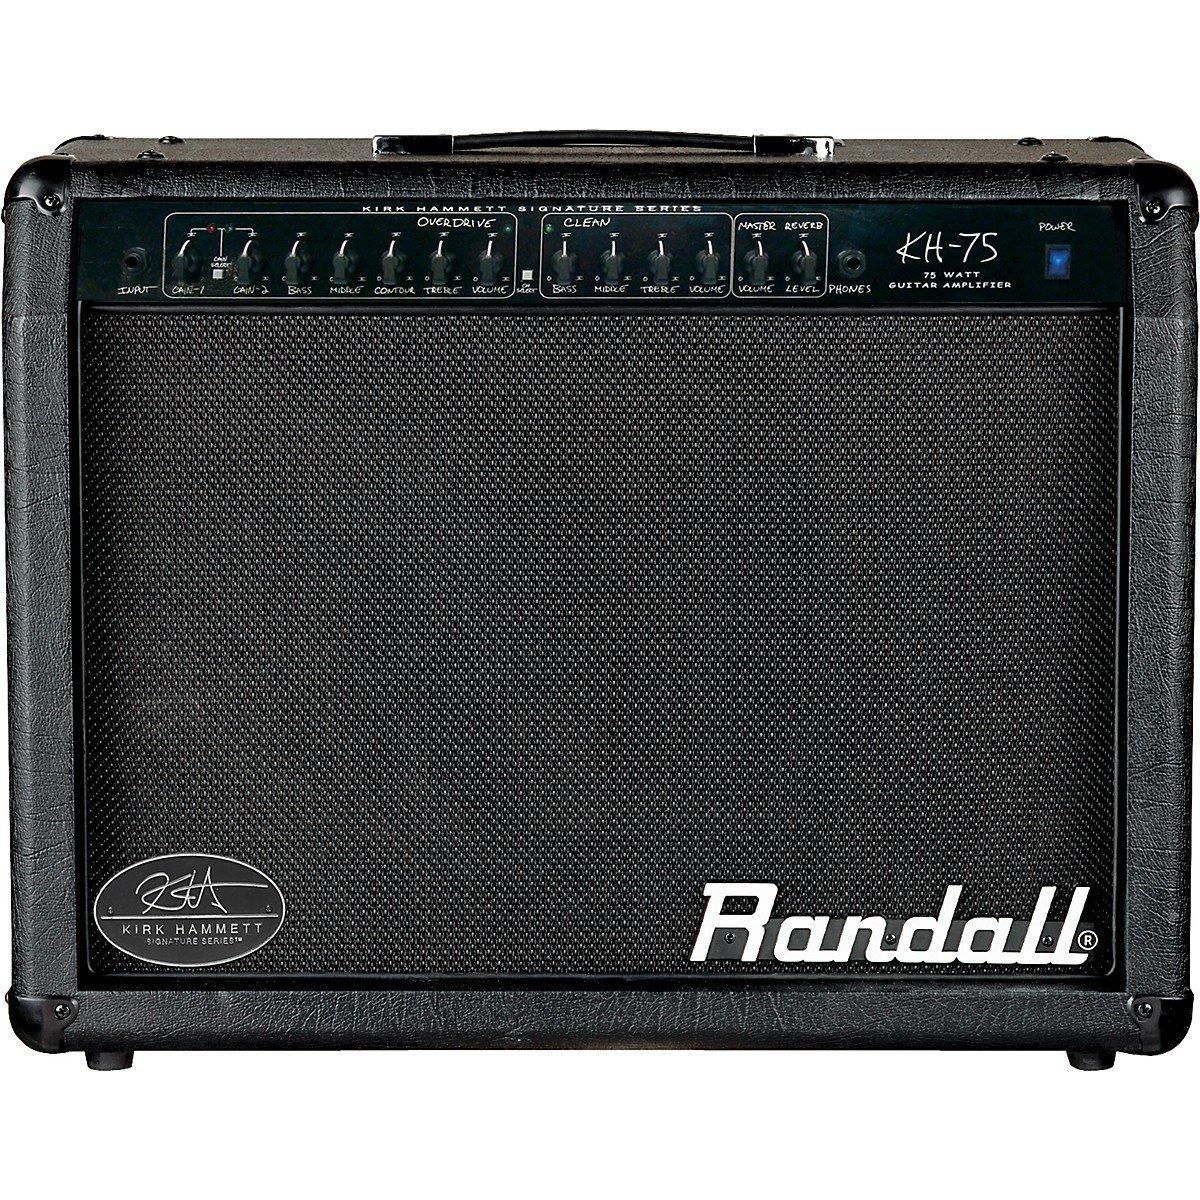 Randall Kirk Hammett Signature RX Series Heads/Combos, KH75 by Randall